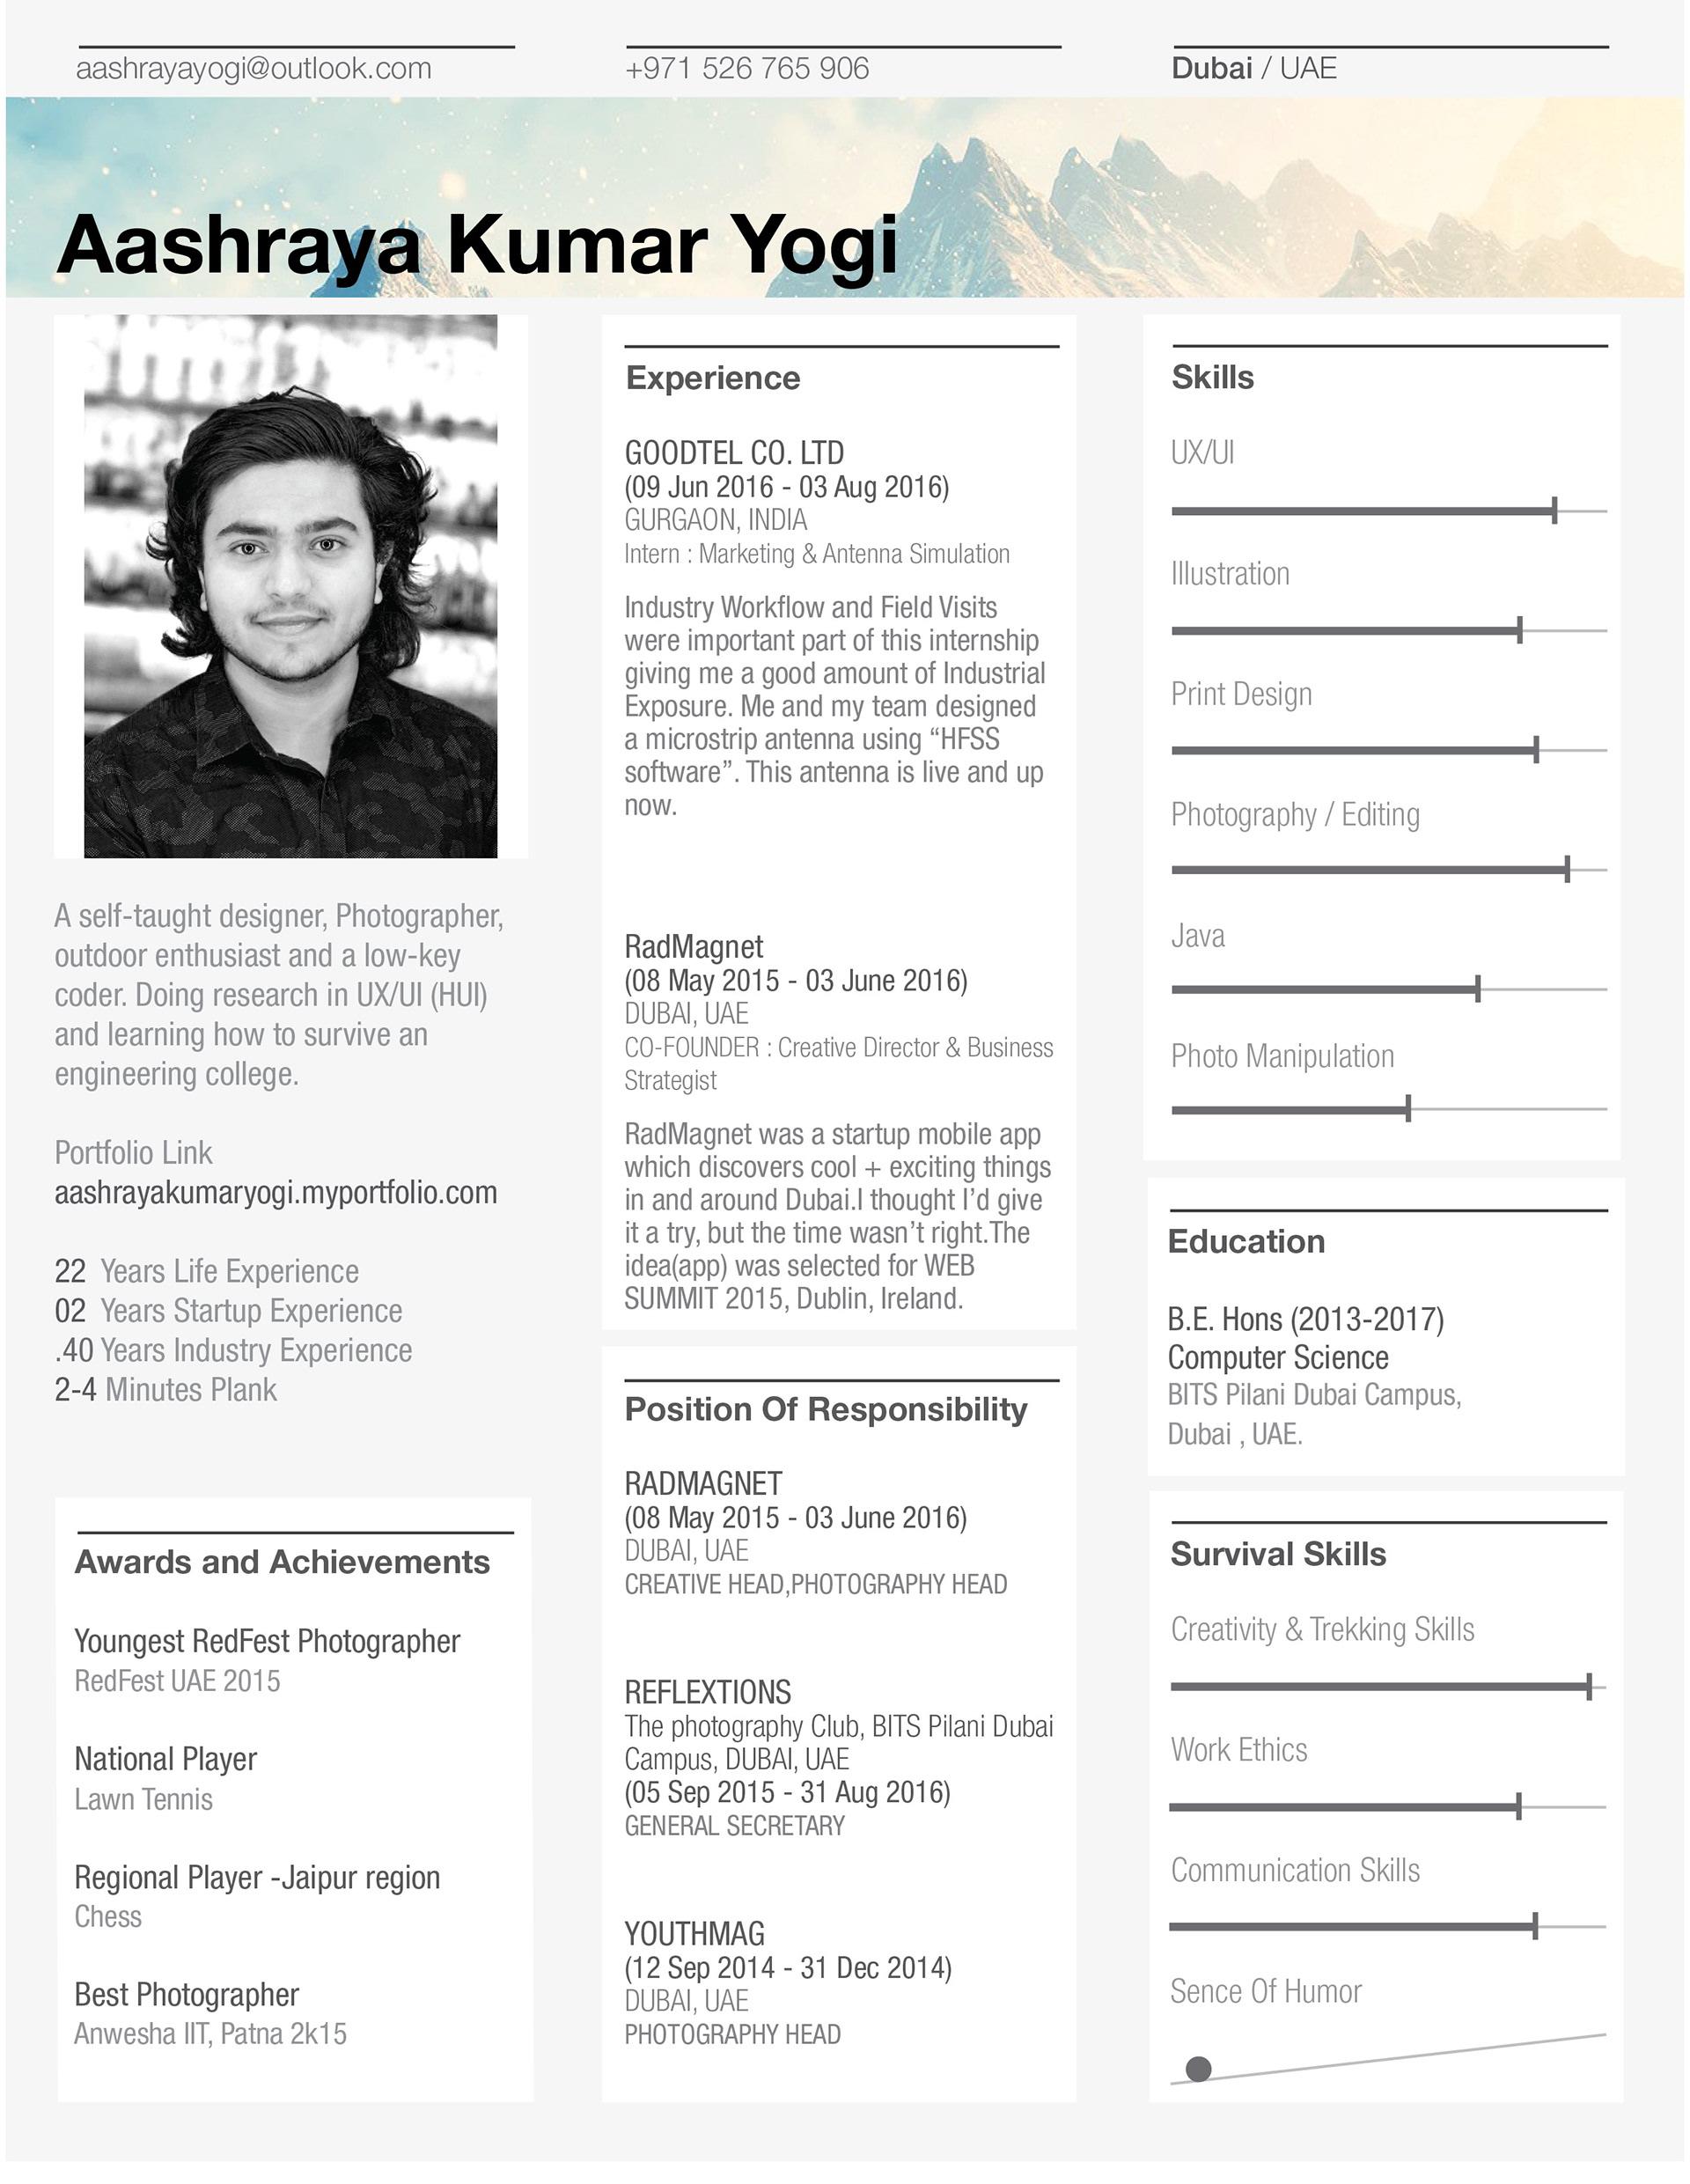 iit computer science student resume nursing resume best